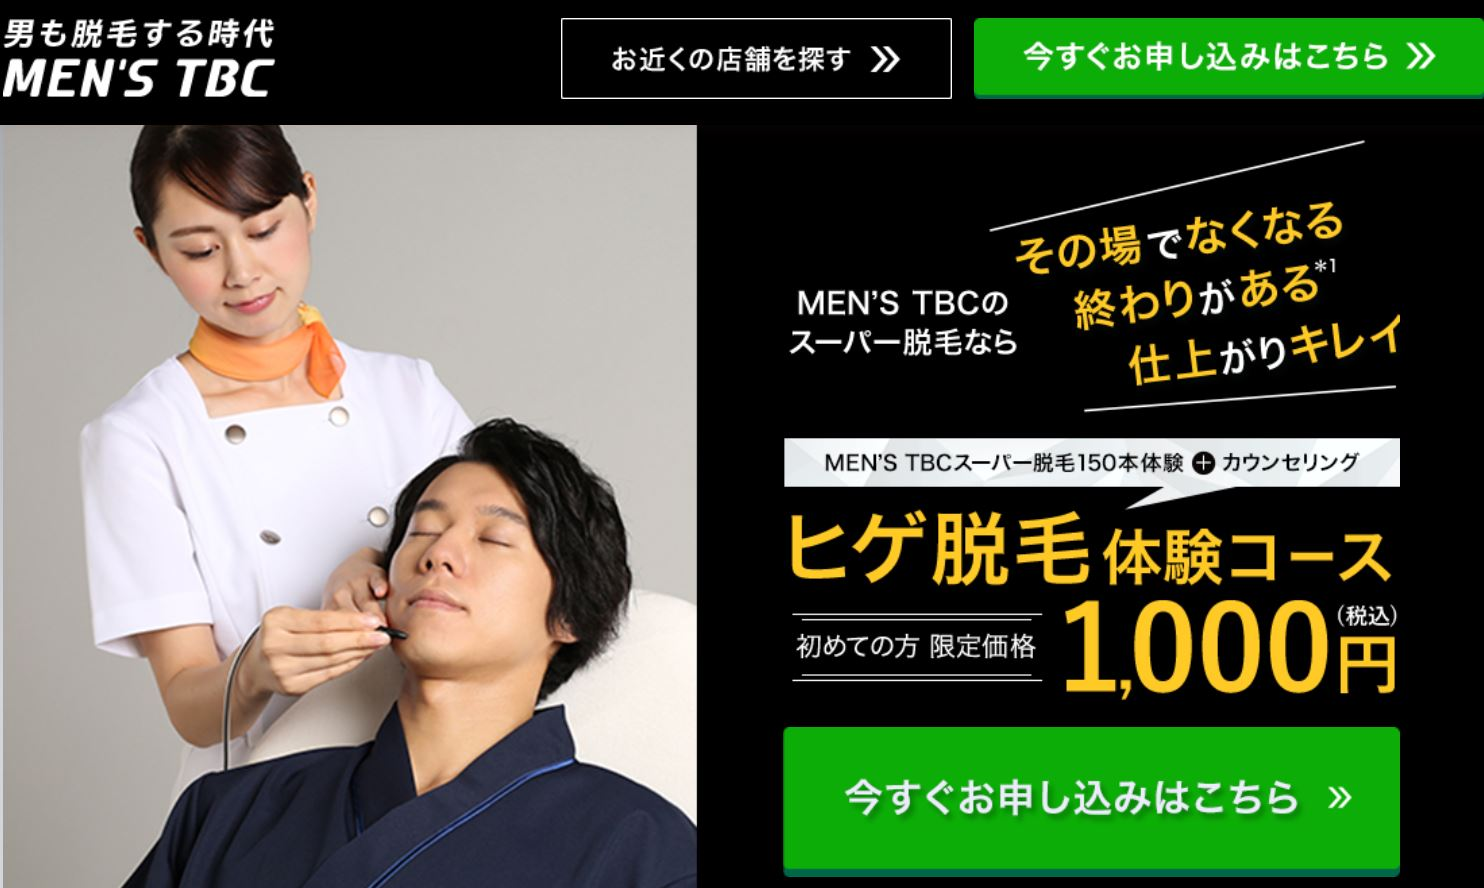 MEN'S TBC 新宿本店